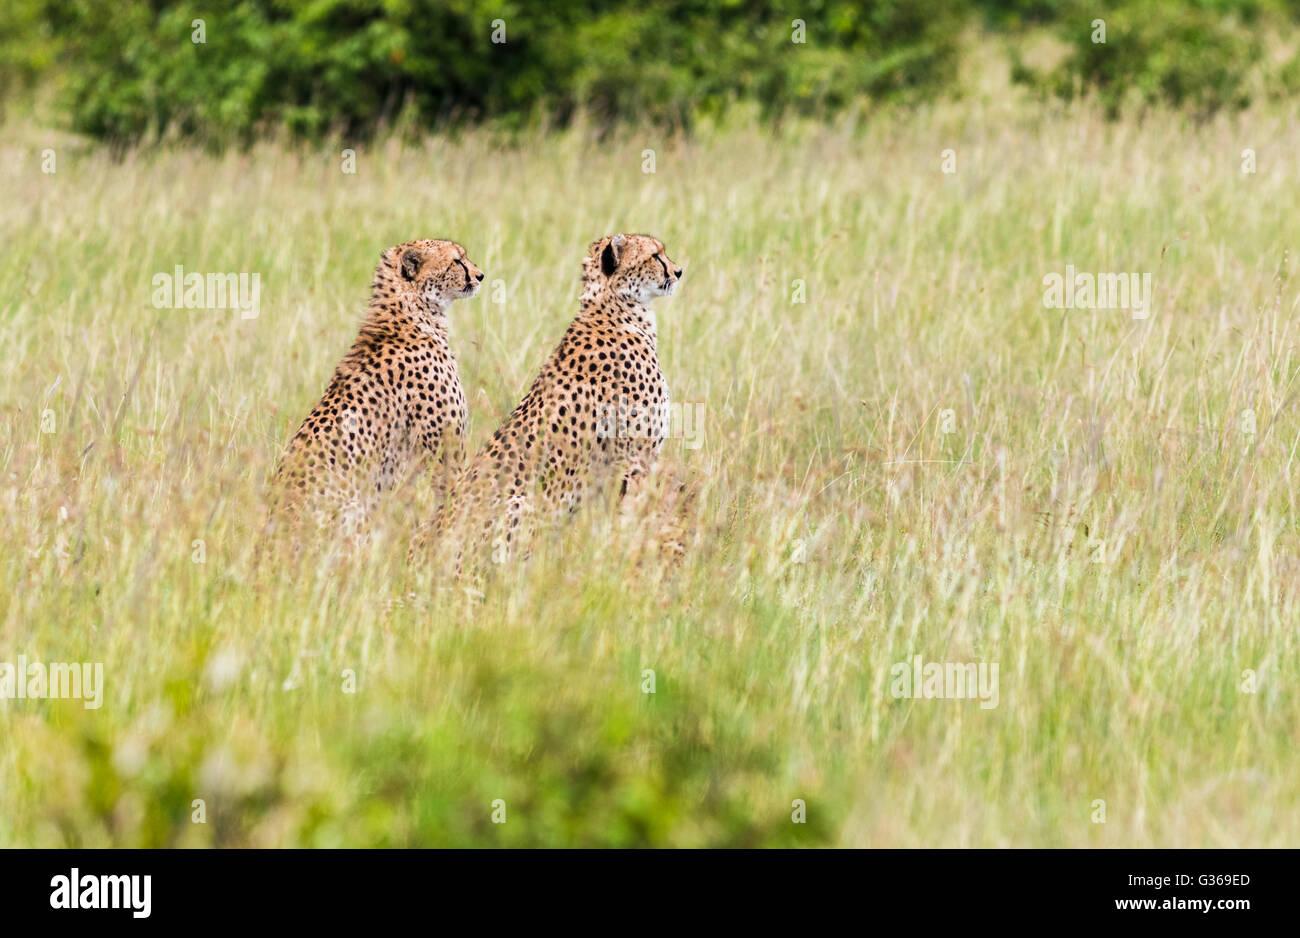 Two cheetahs in Masai Mara sitting in the the grass looking at something, Masai Mara, Kenya , Africa - Stock Image